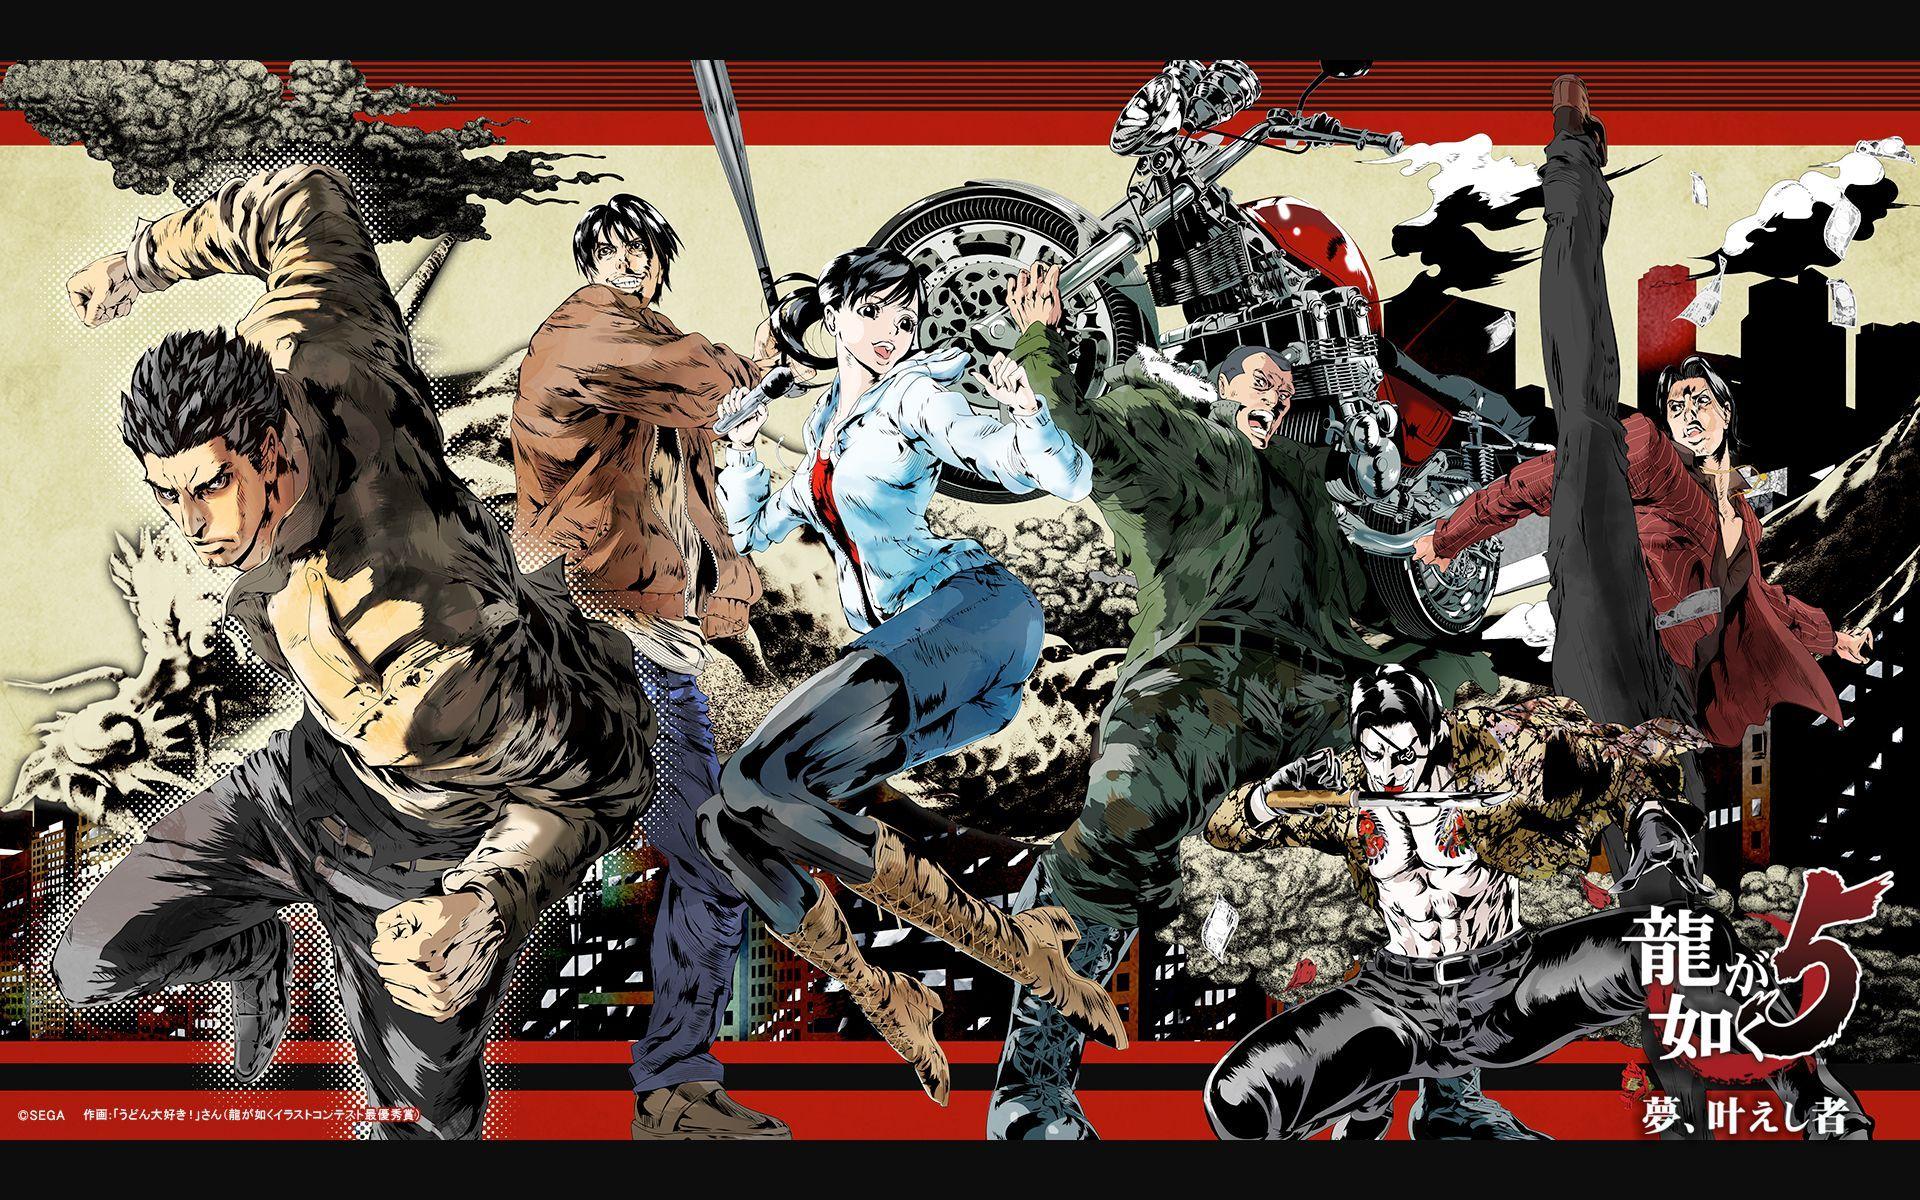 Yakuza 5 Wallpapers   Top Yakuza 5 Backgrounds   WallpaperAccess 1920x1200